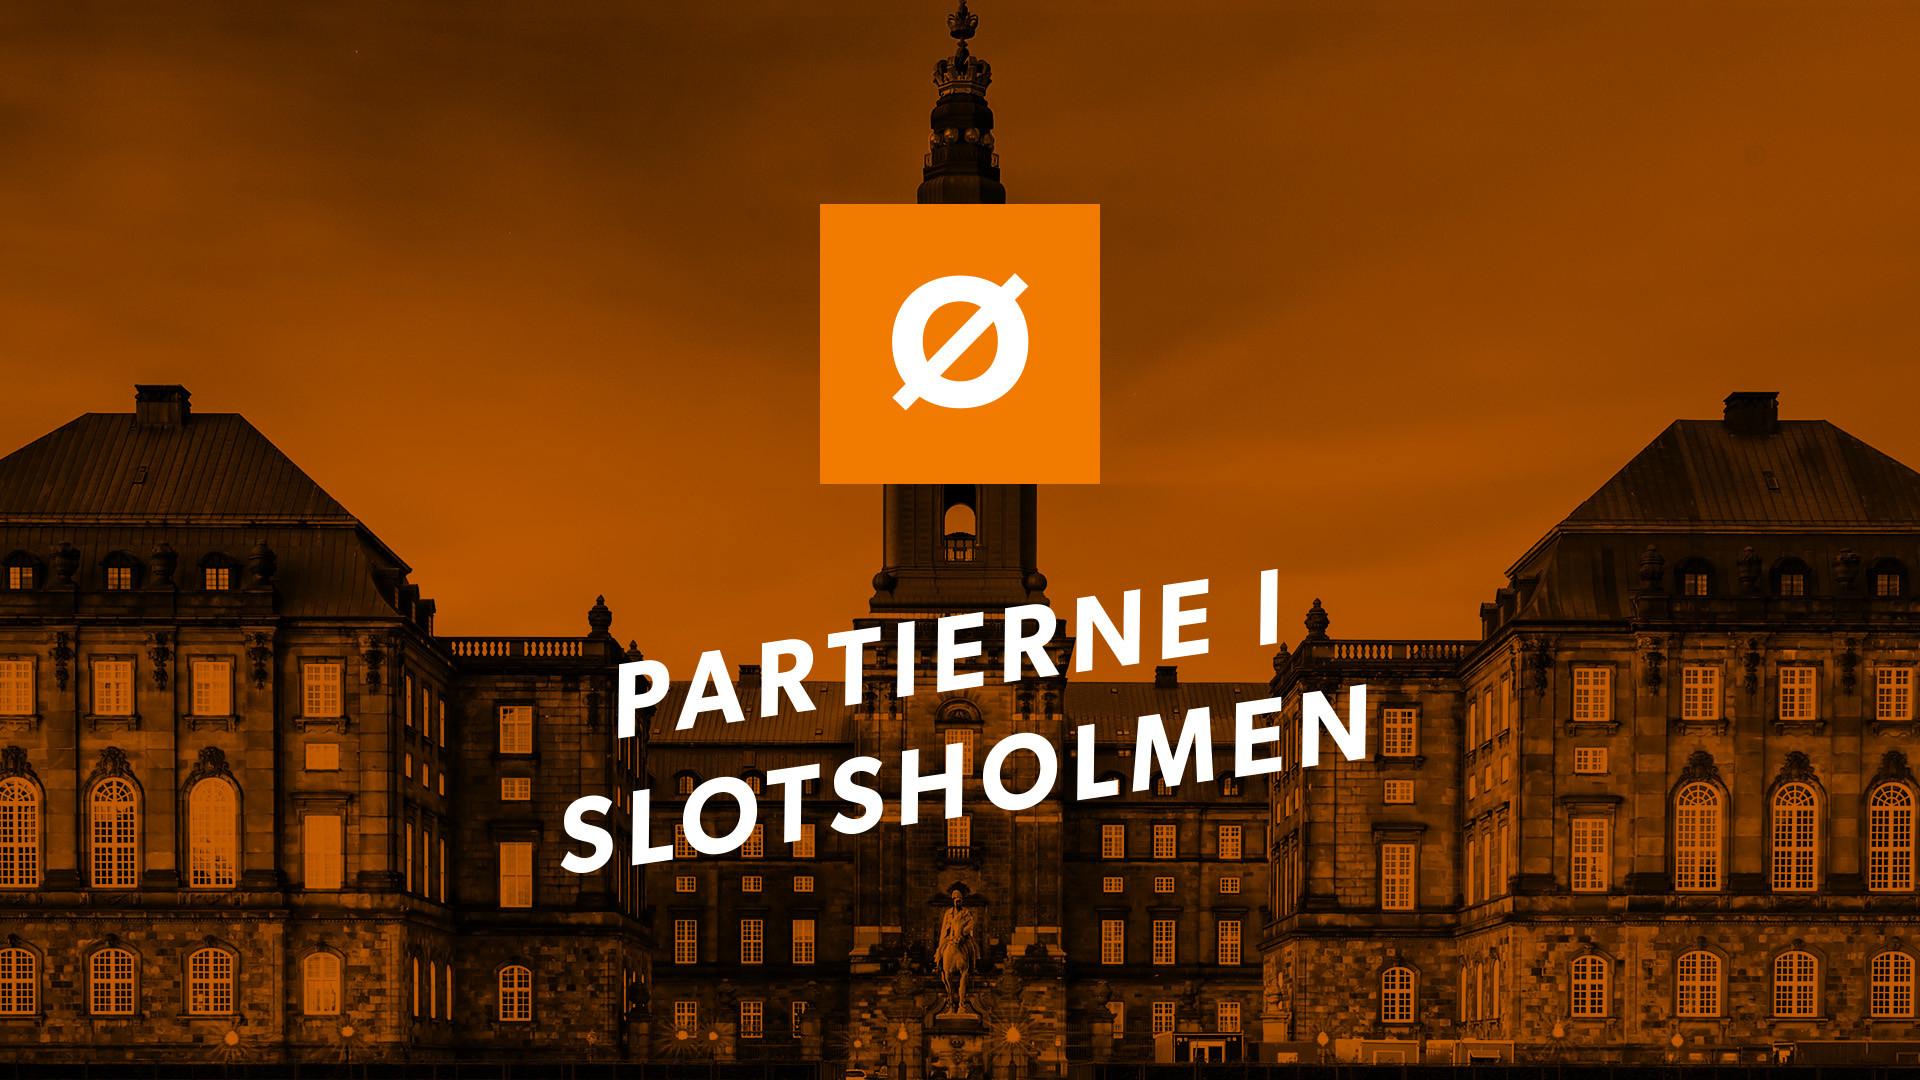 slotsholmen-enhedslisten_0.jpg